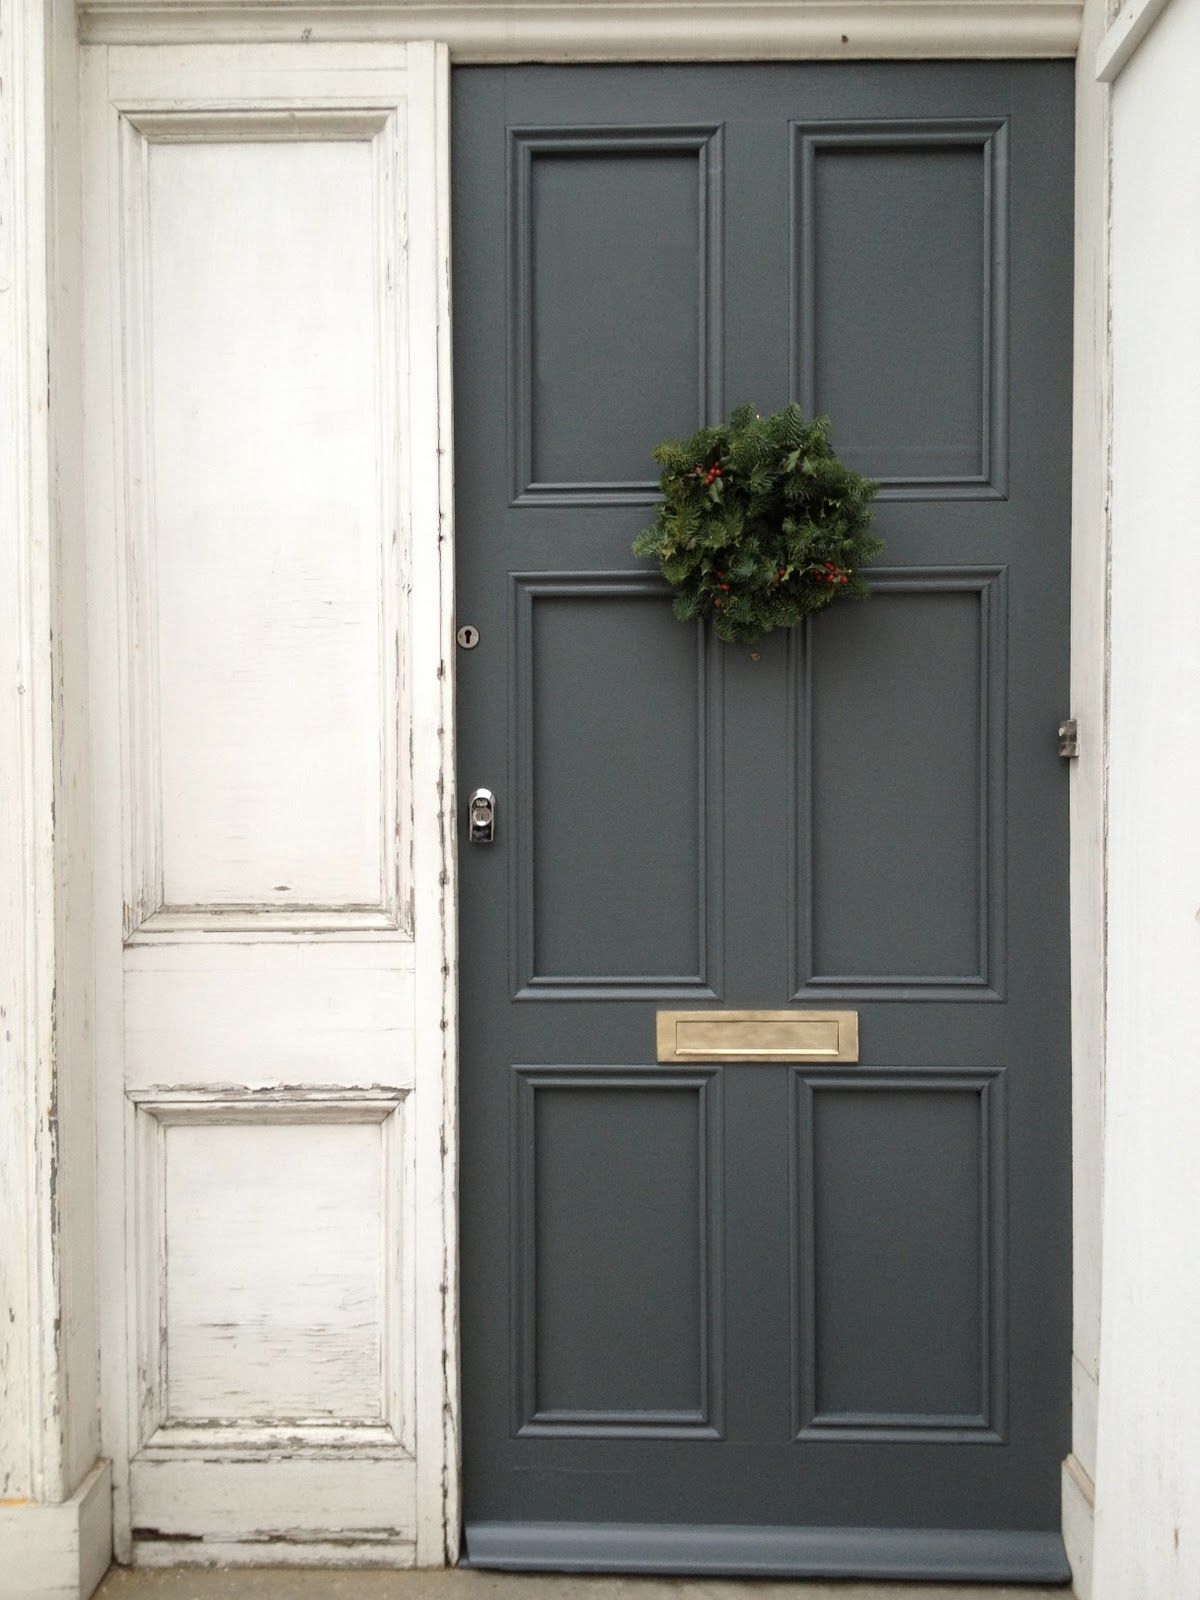 farrow ball downpipe doors door paint colors doors paint colors rh pinterest com